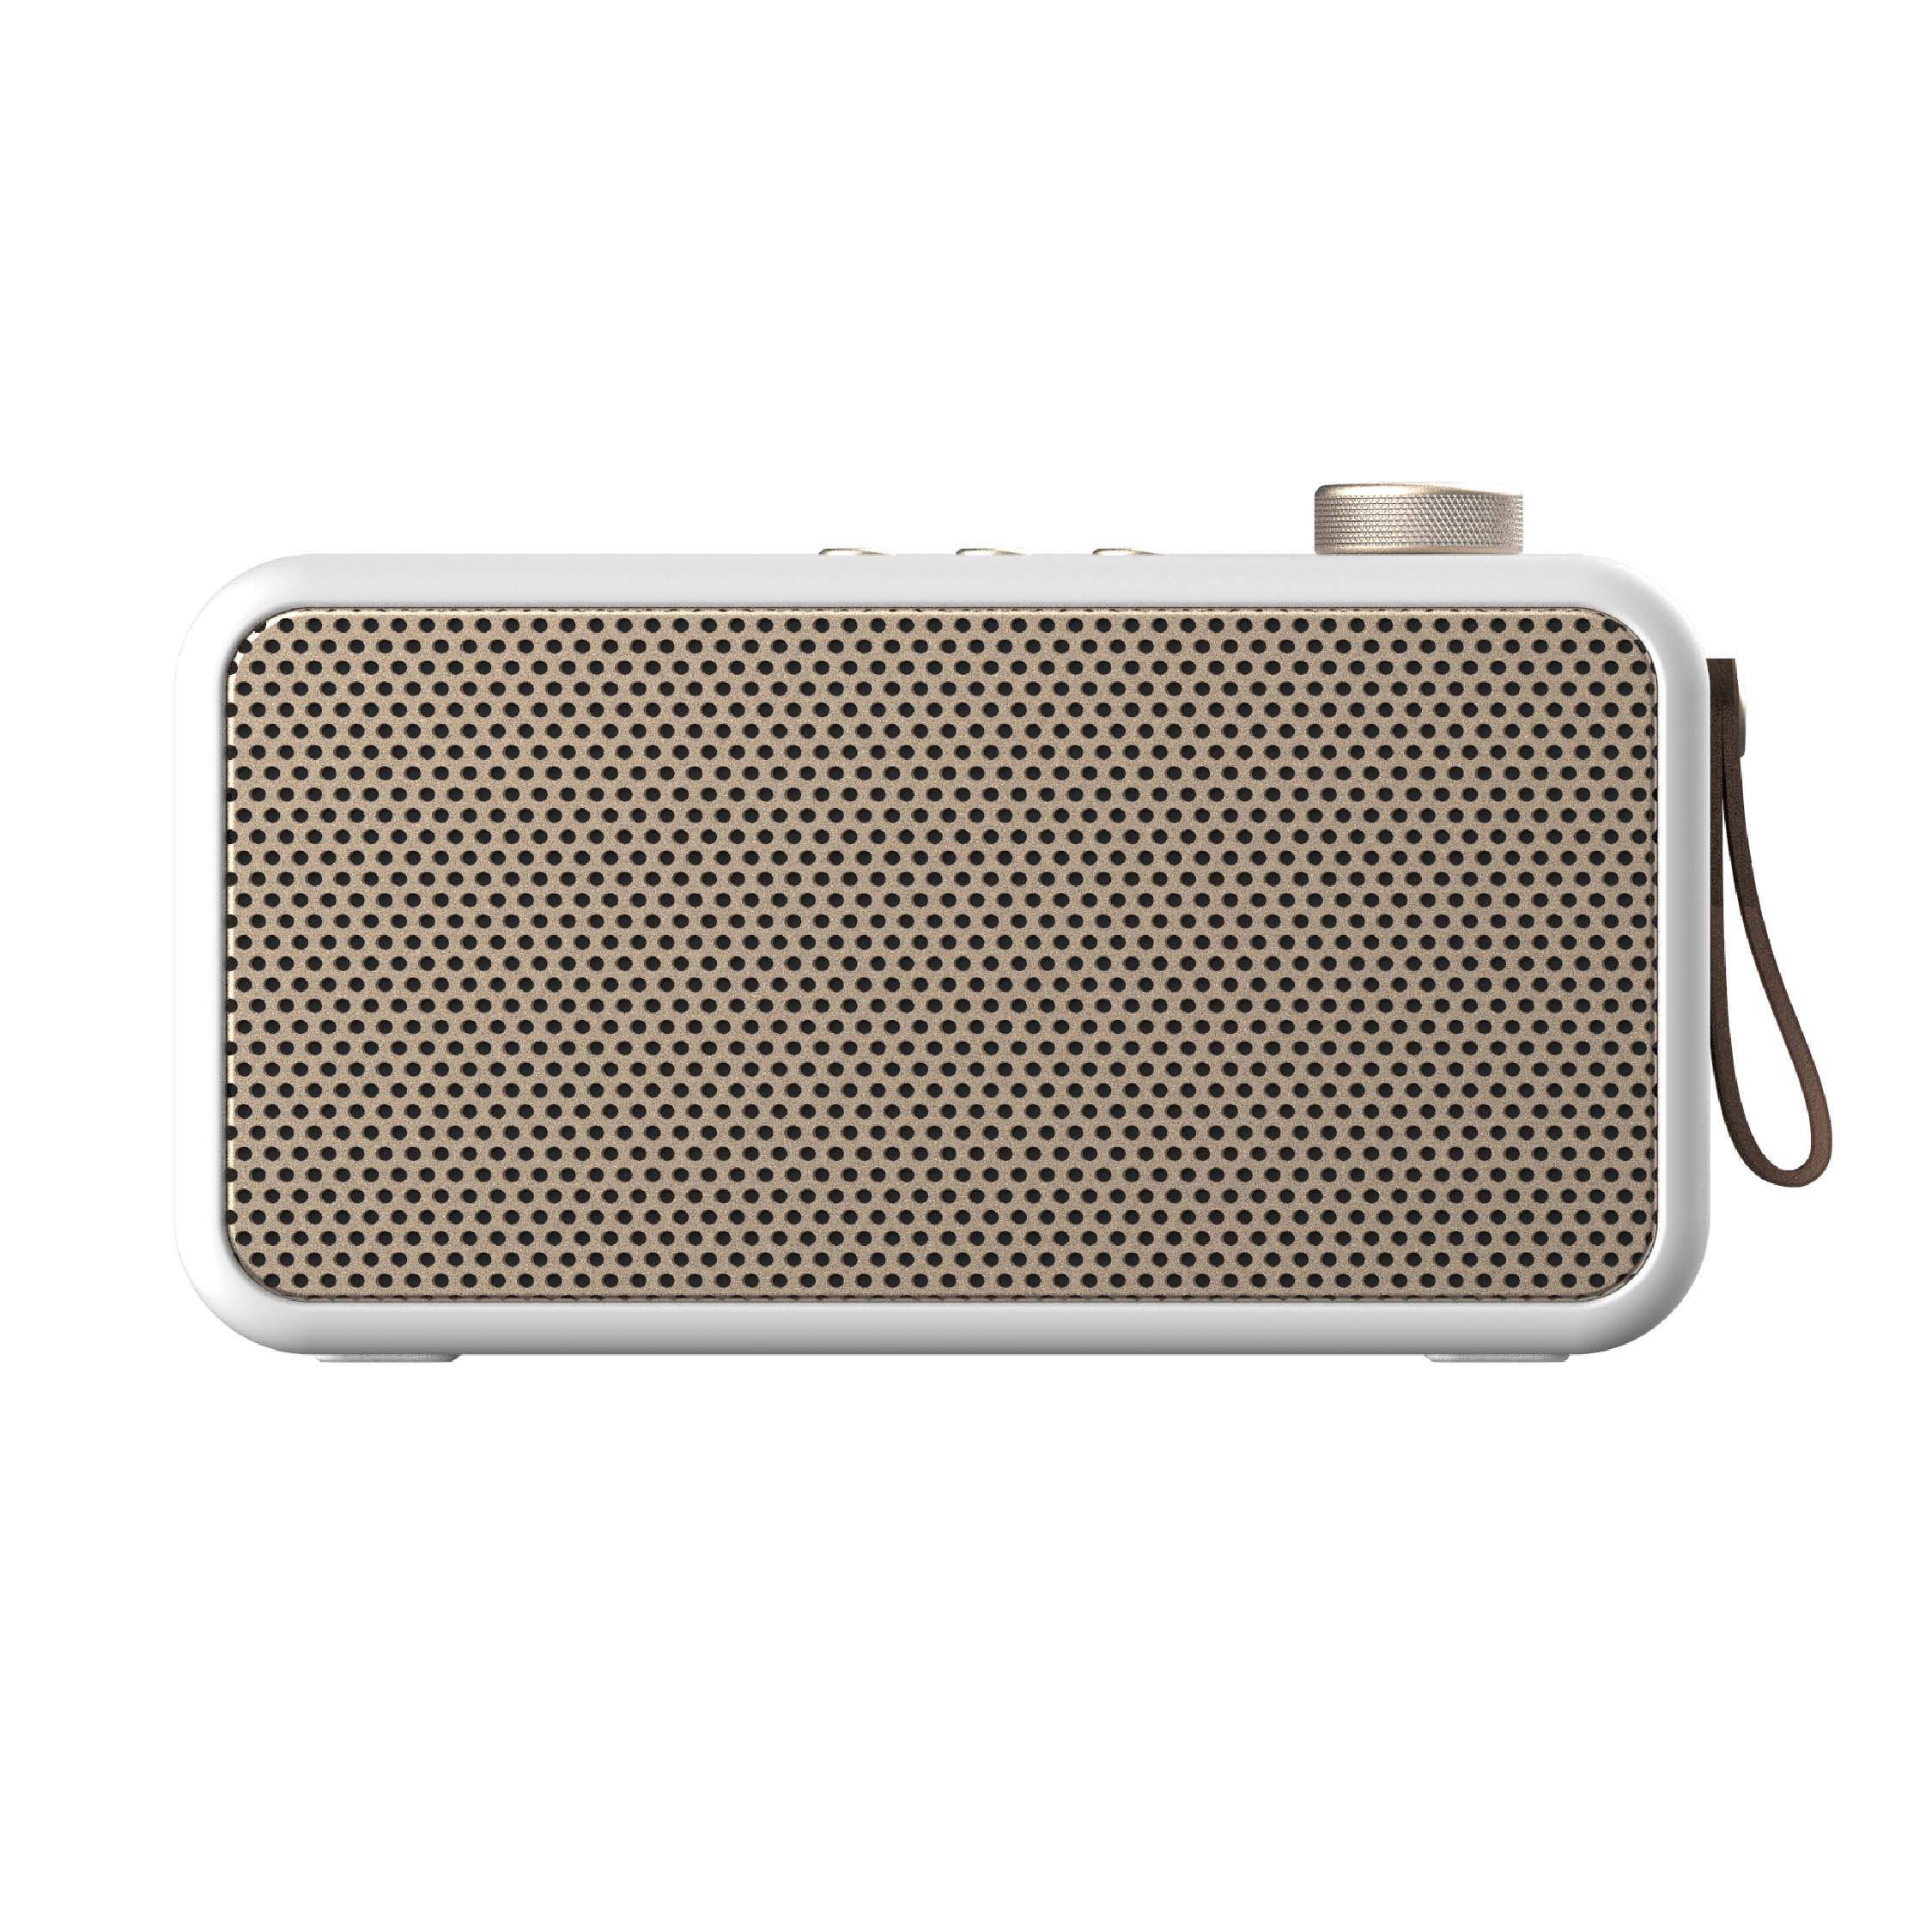 Enceinte bluetooth avec radio FM blanc